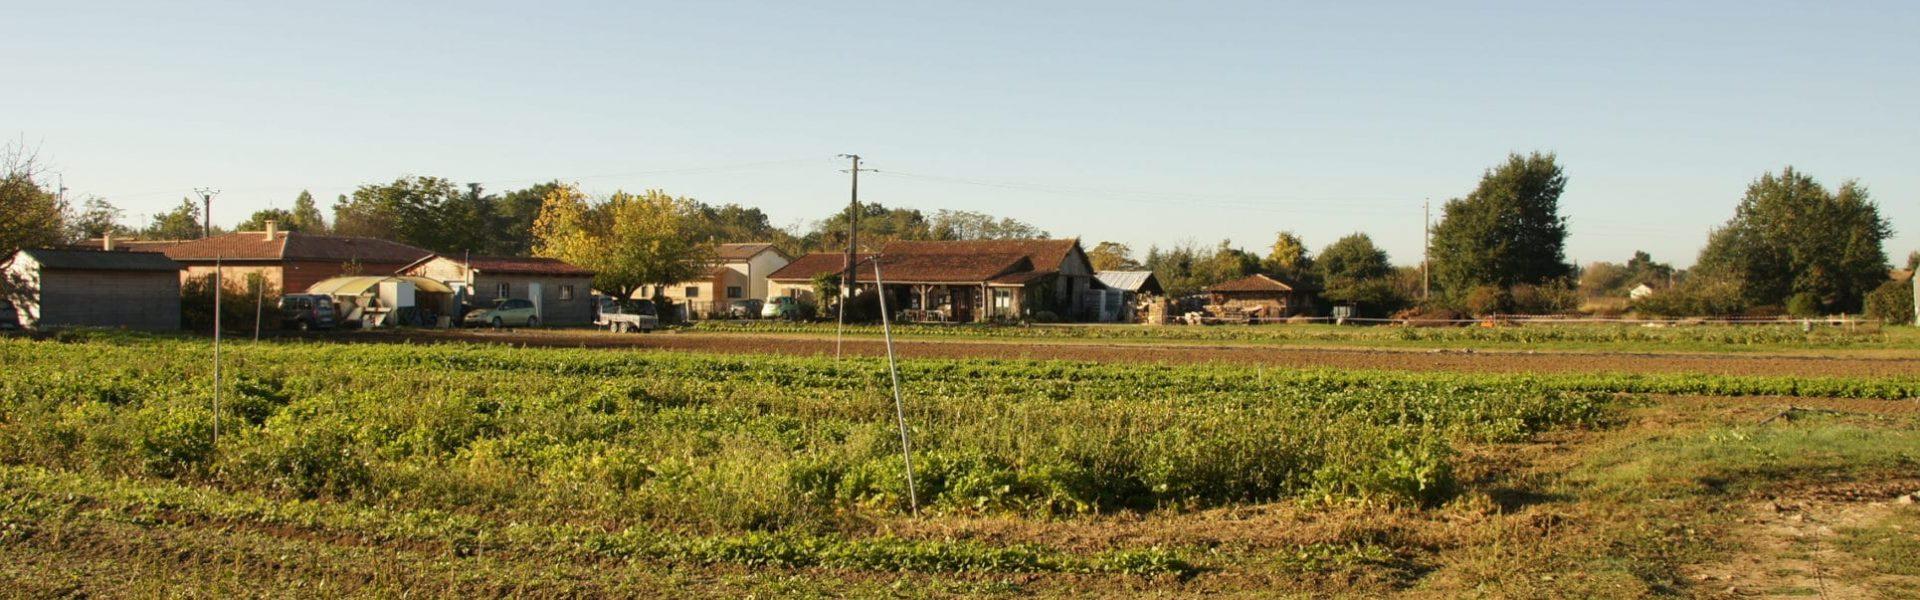 Photo du jardin vu depuis les serres